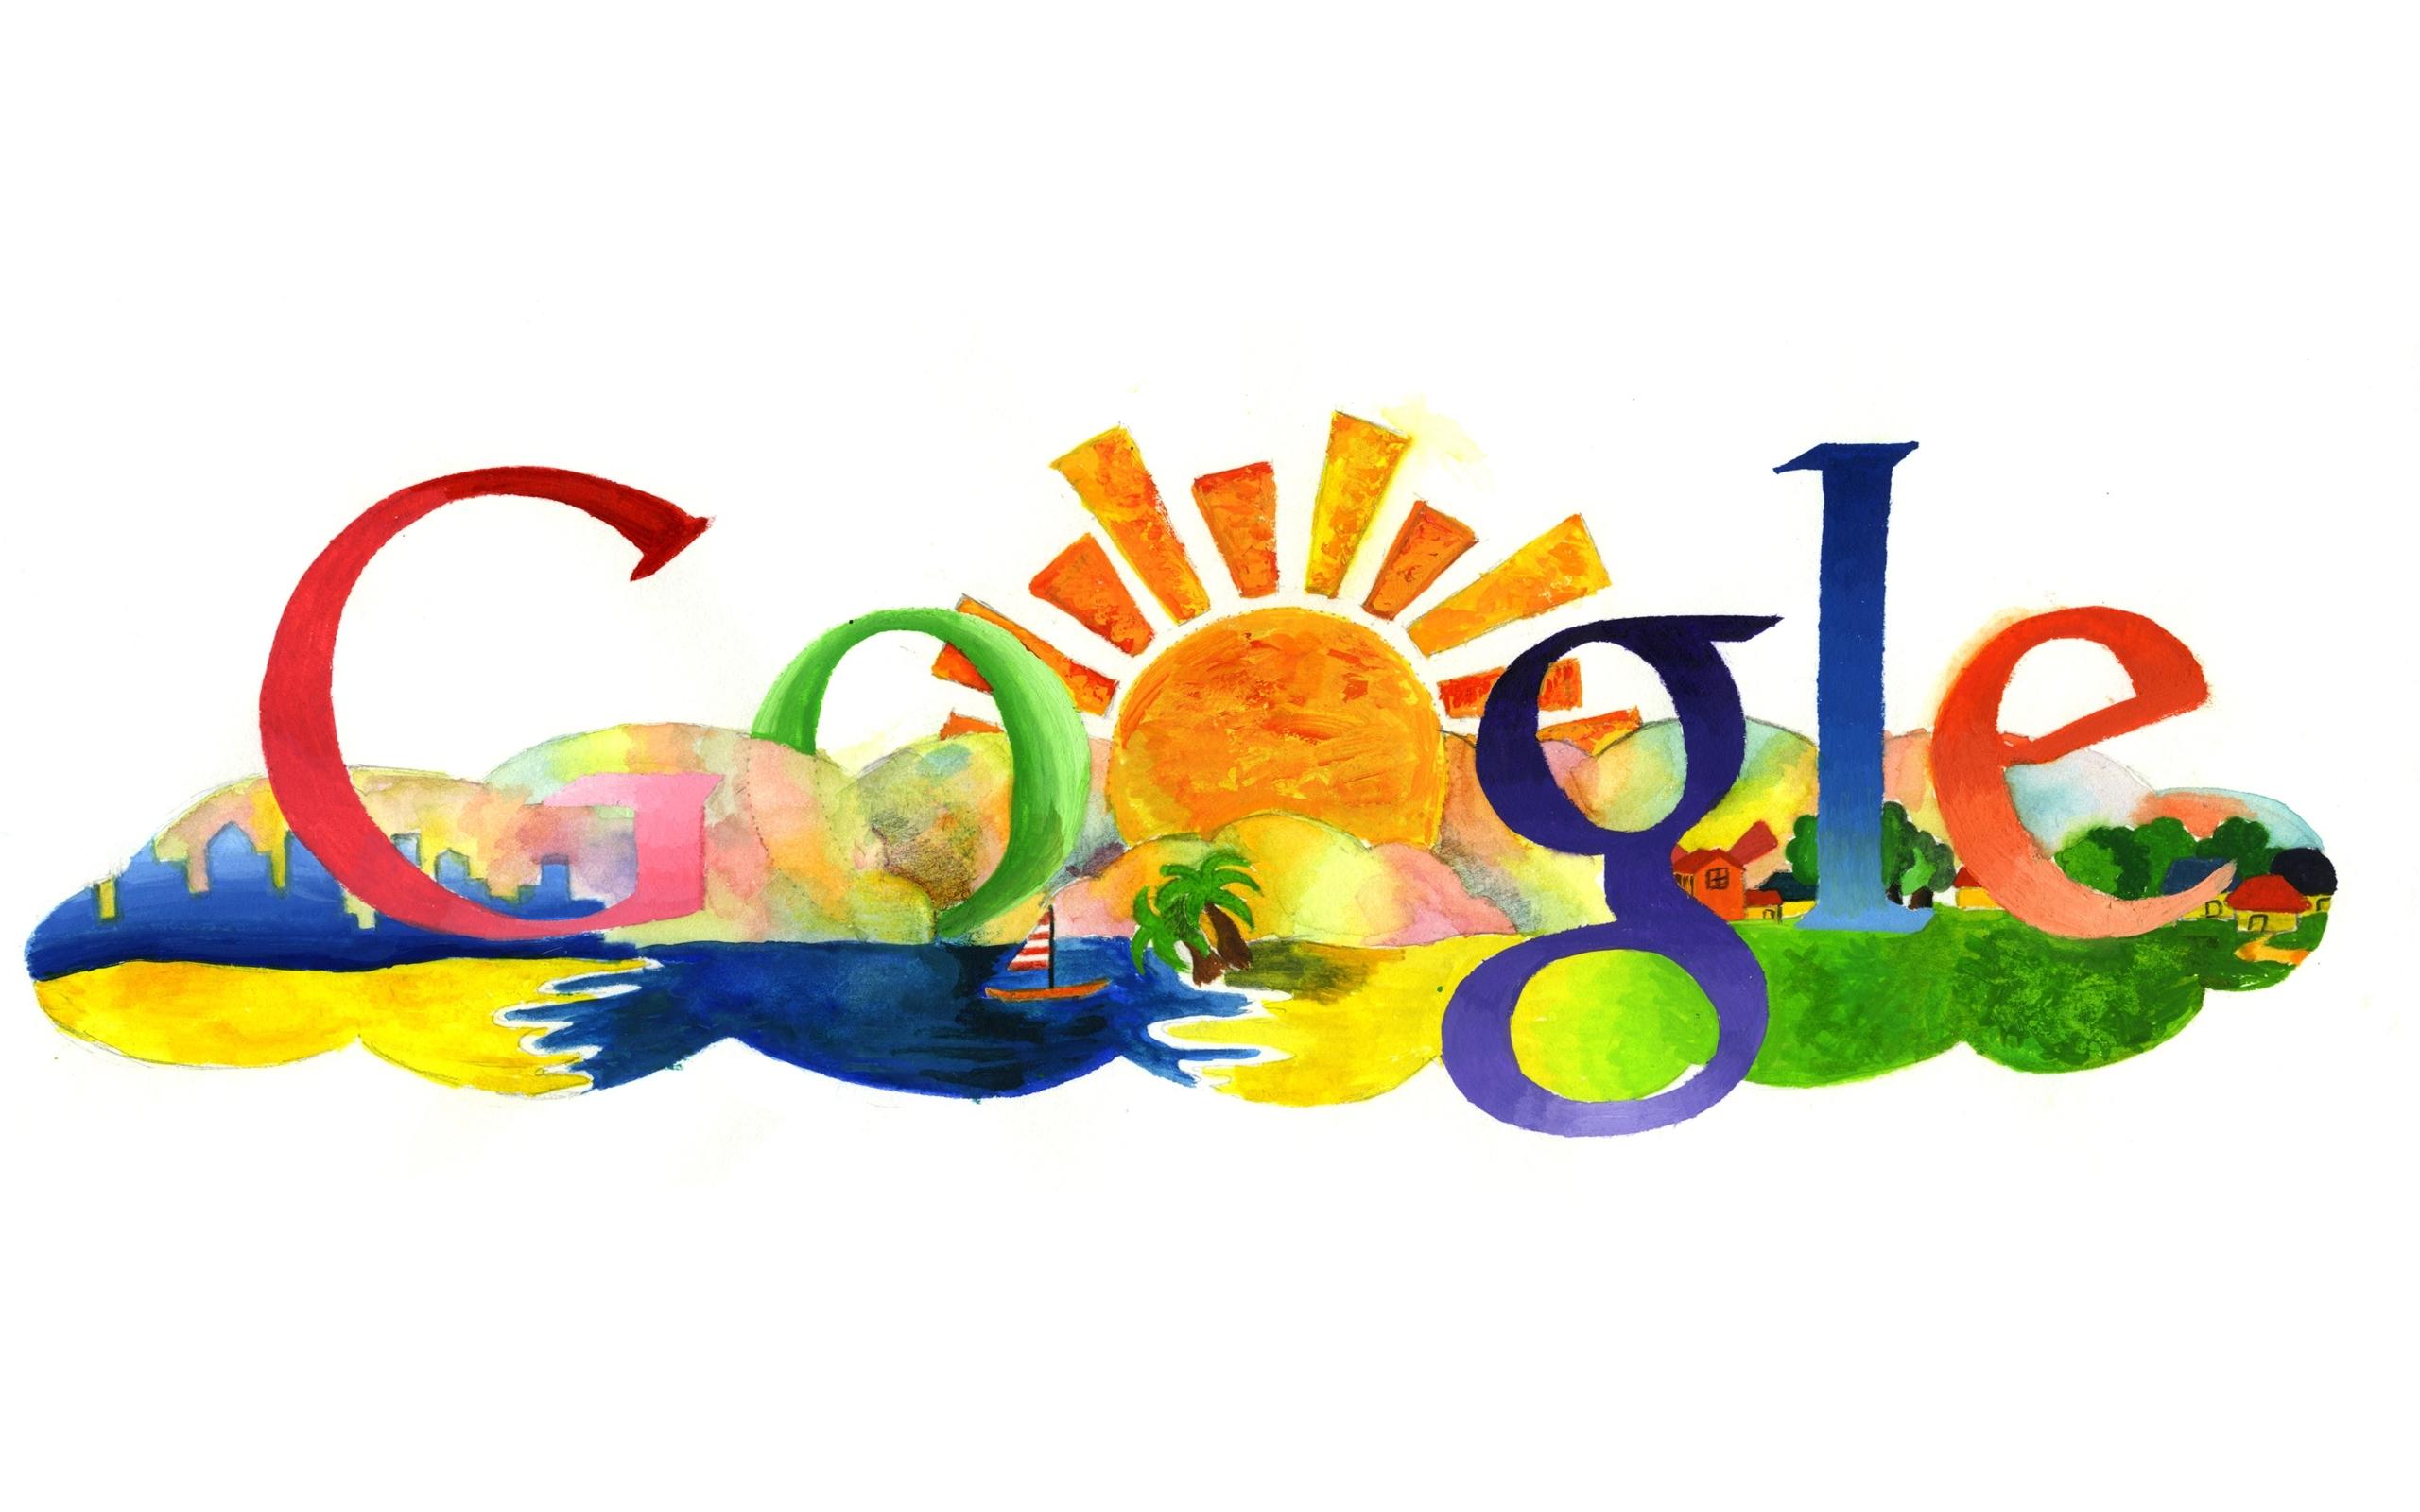 Free google clip art images jpg free stock Free Google Wallpaper jpg free stock